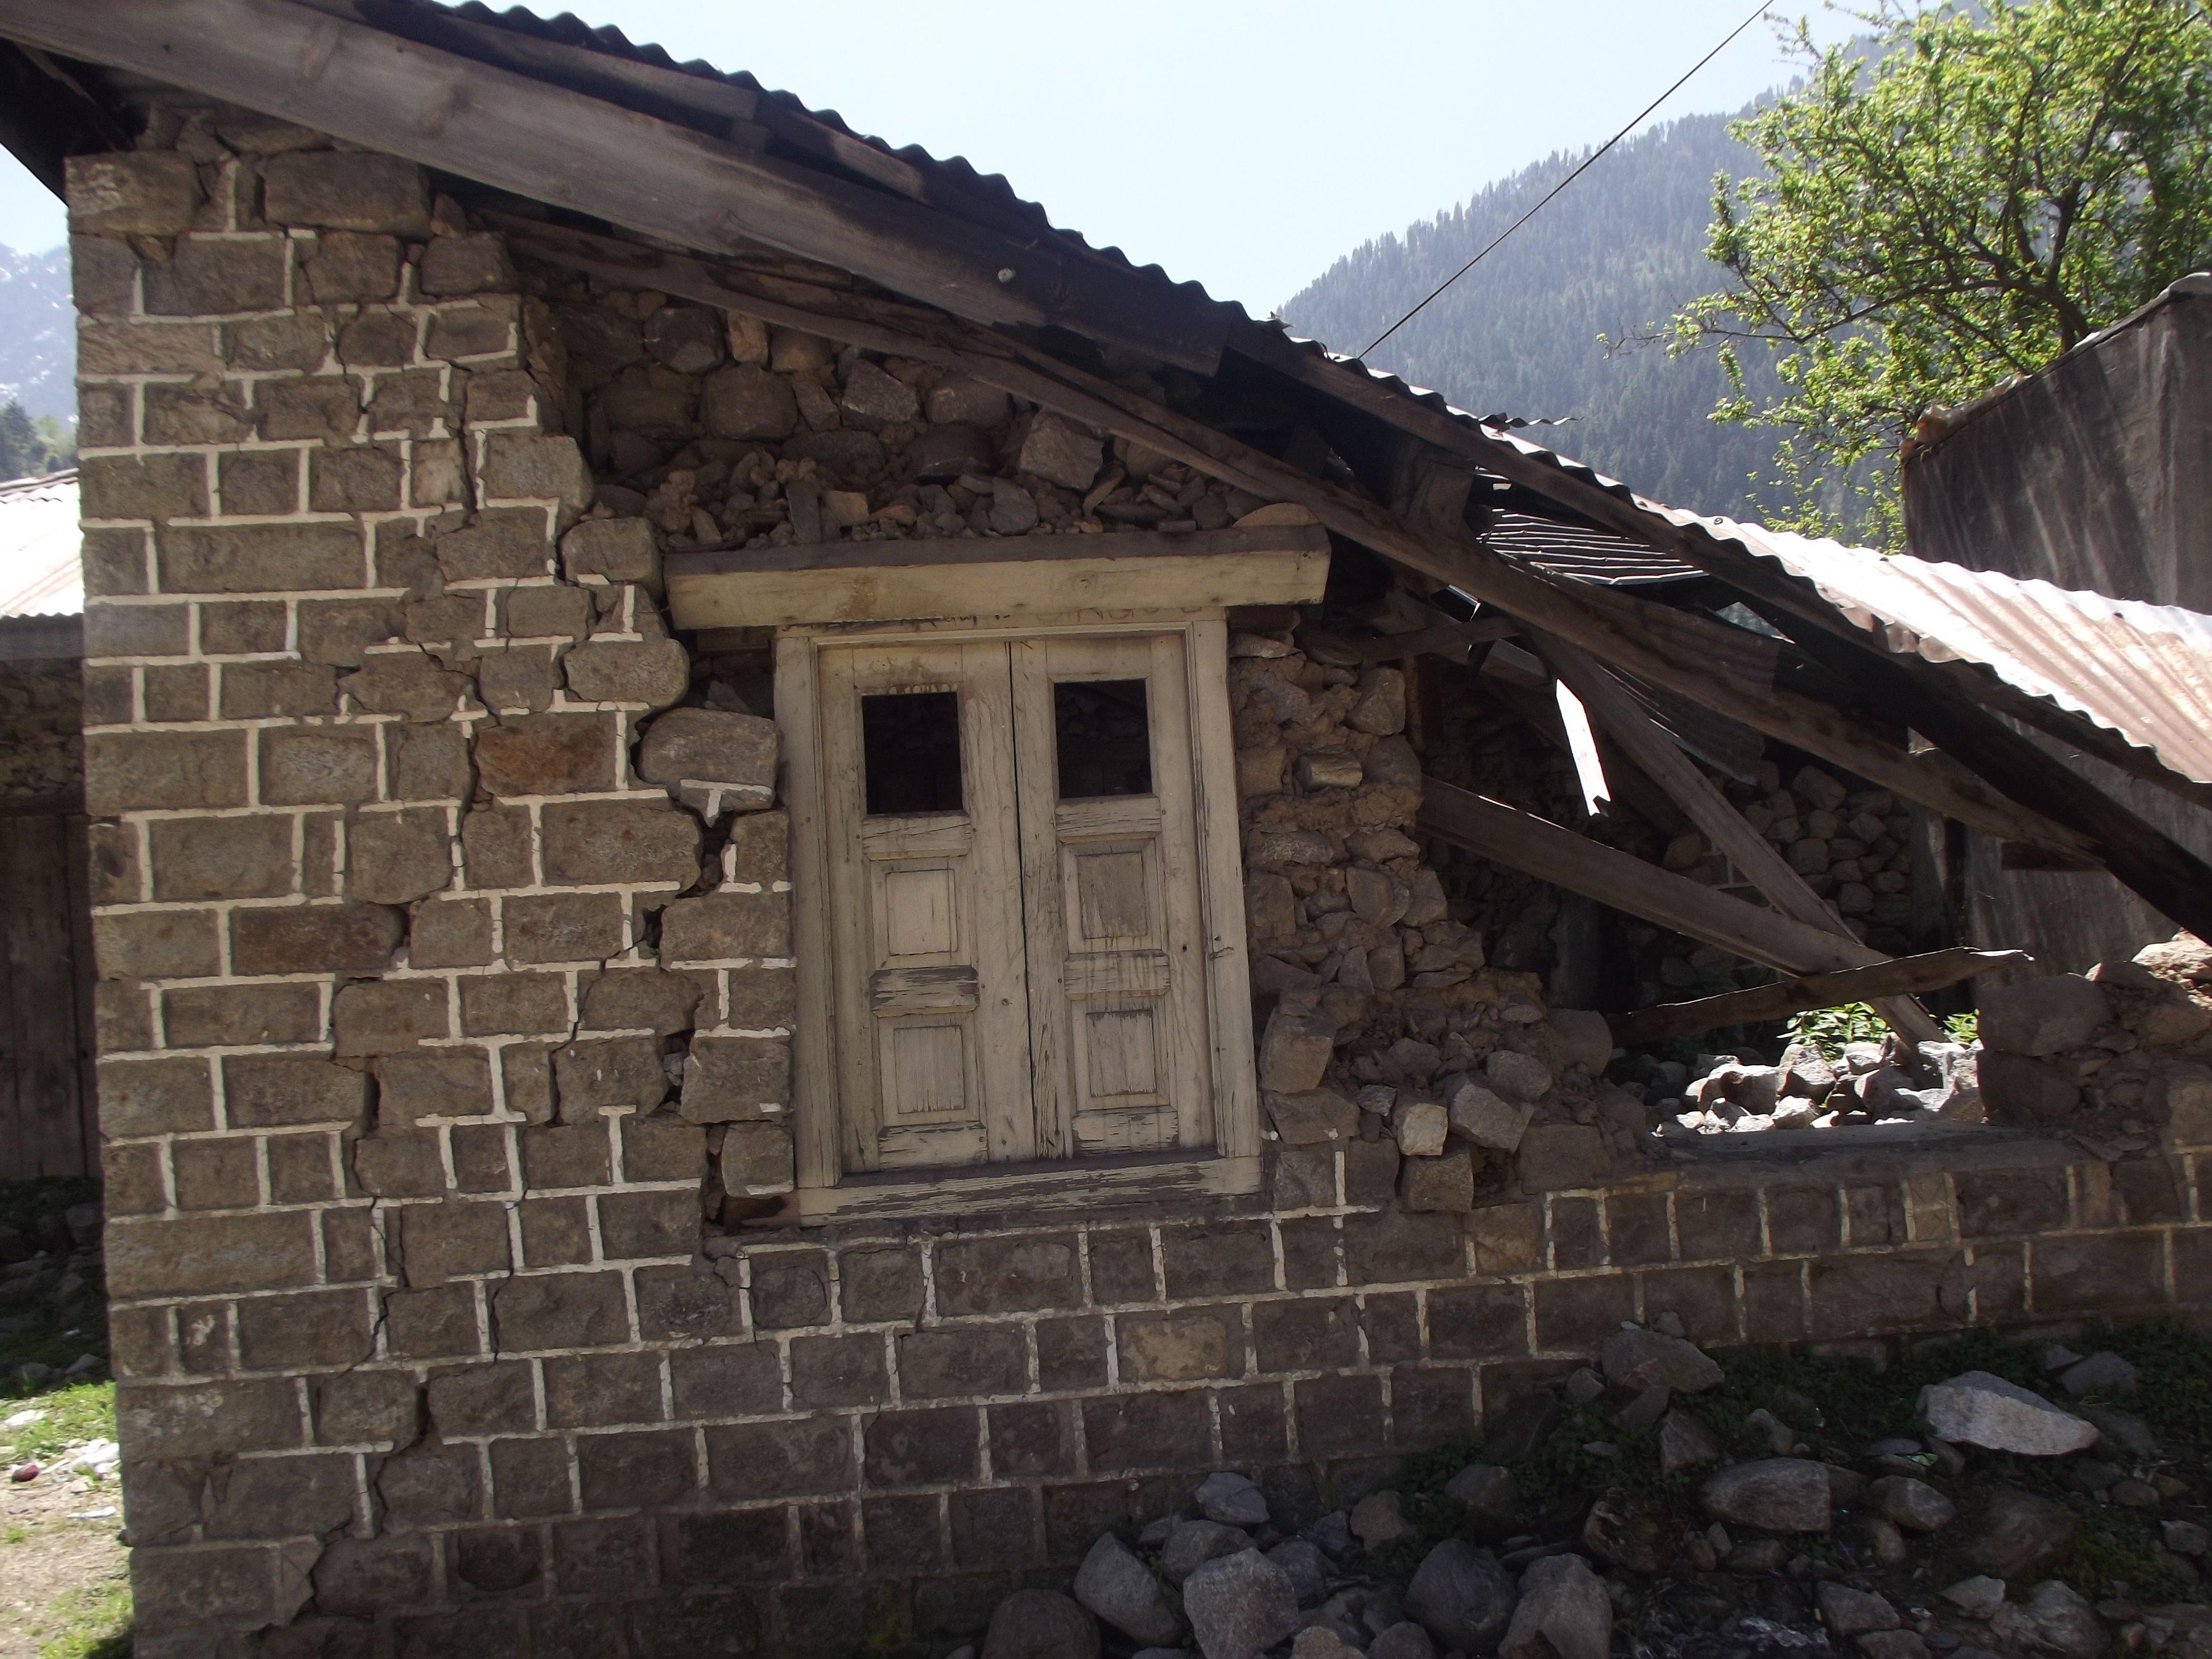 Kashmir Keran Broken Old House Stone Walls Wooden Rafters And Windows Steel Sheets On Roof Stone Wall Old House House Styles